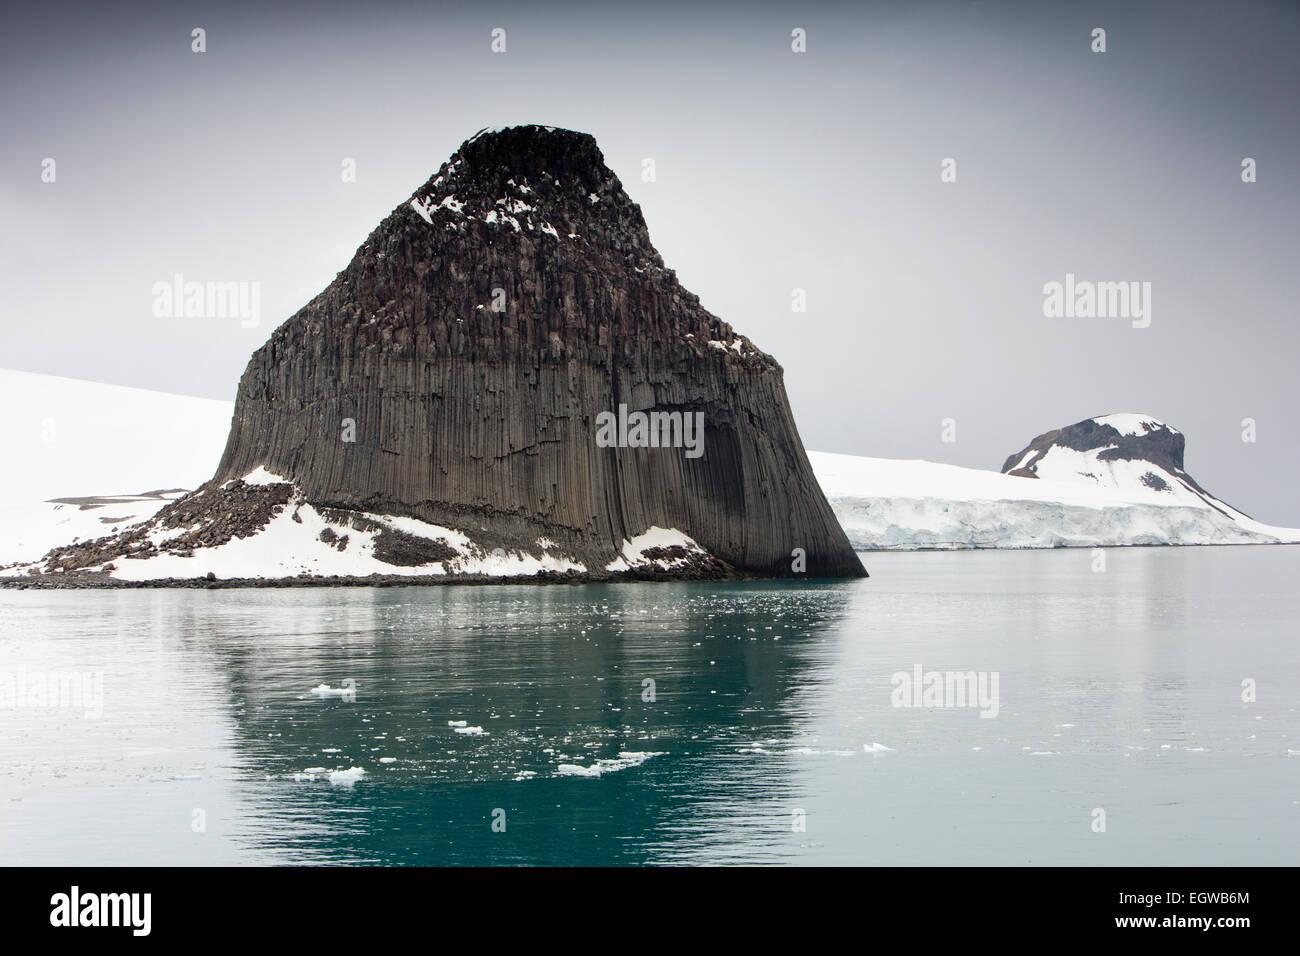 Antarctica, South Shetland Islands, Edinburgh Rock, basalt columns - Stock Image